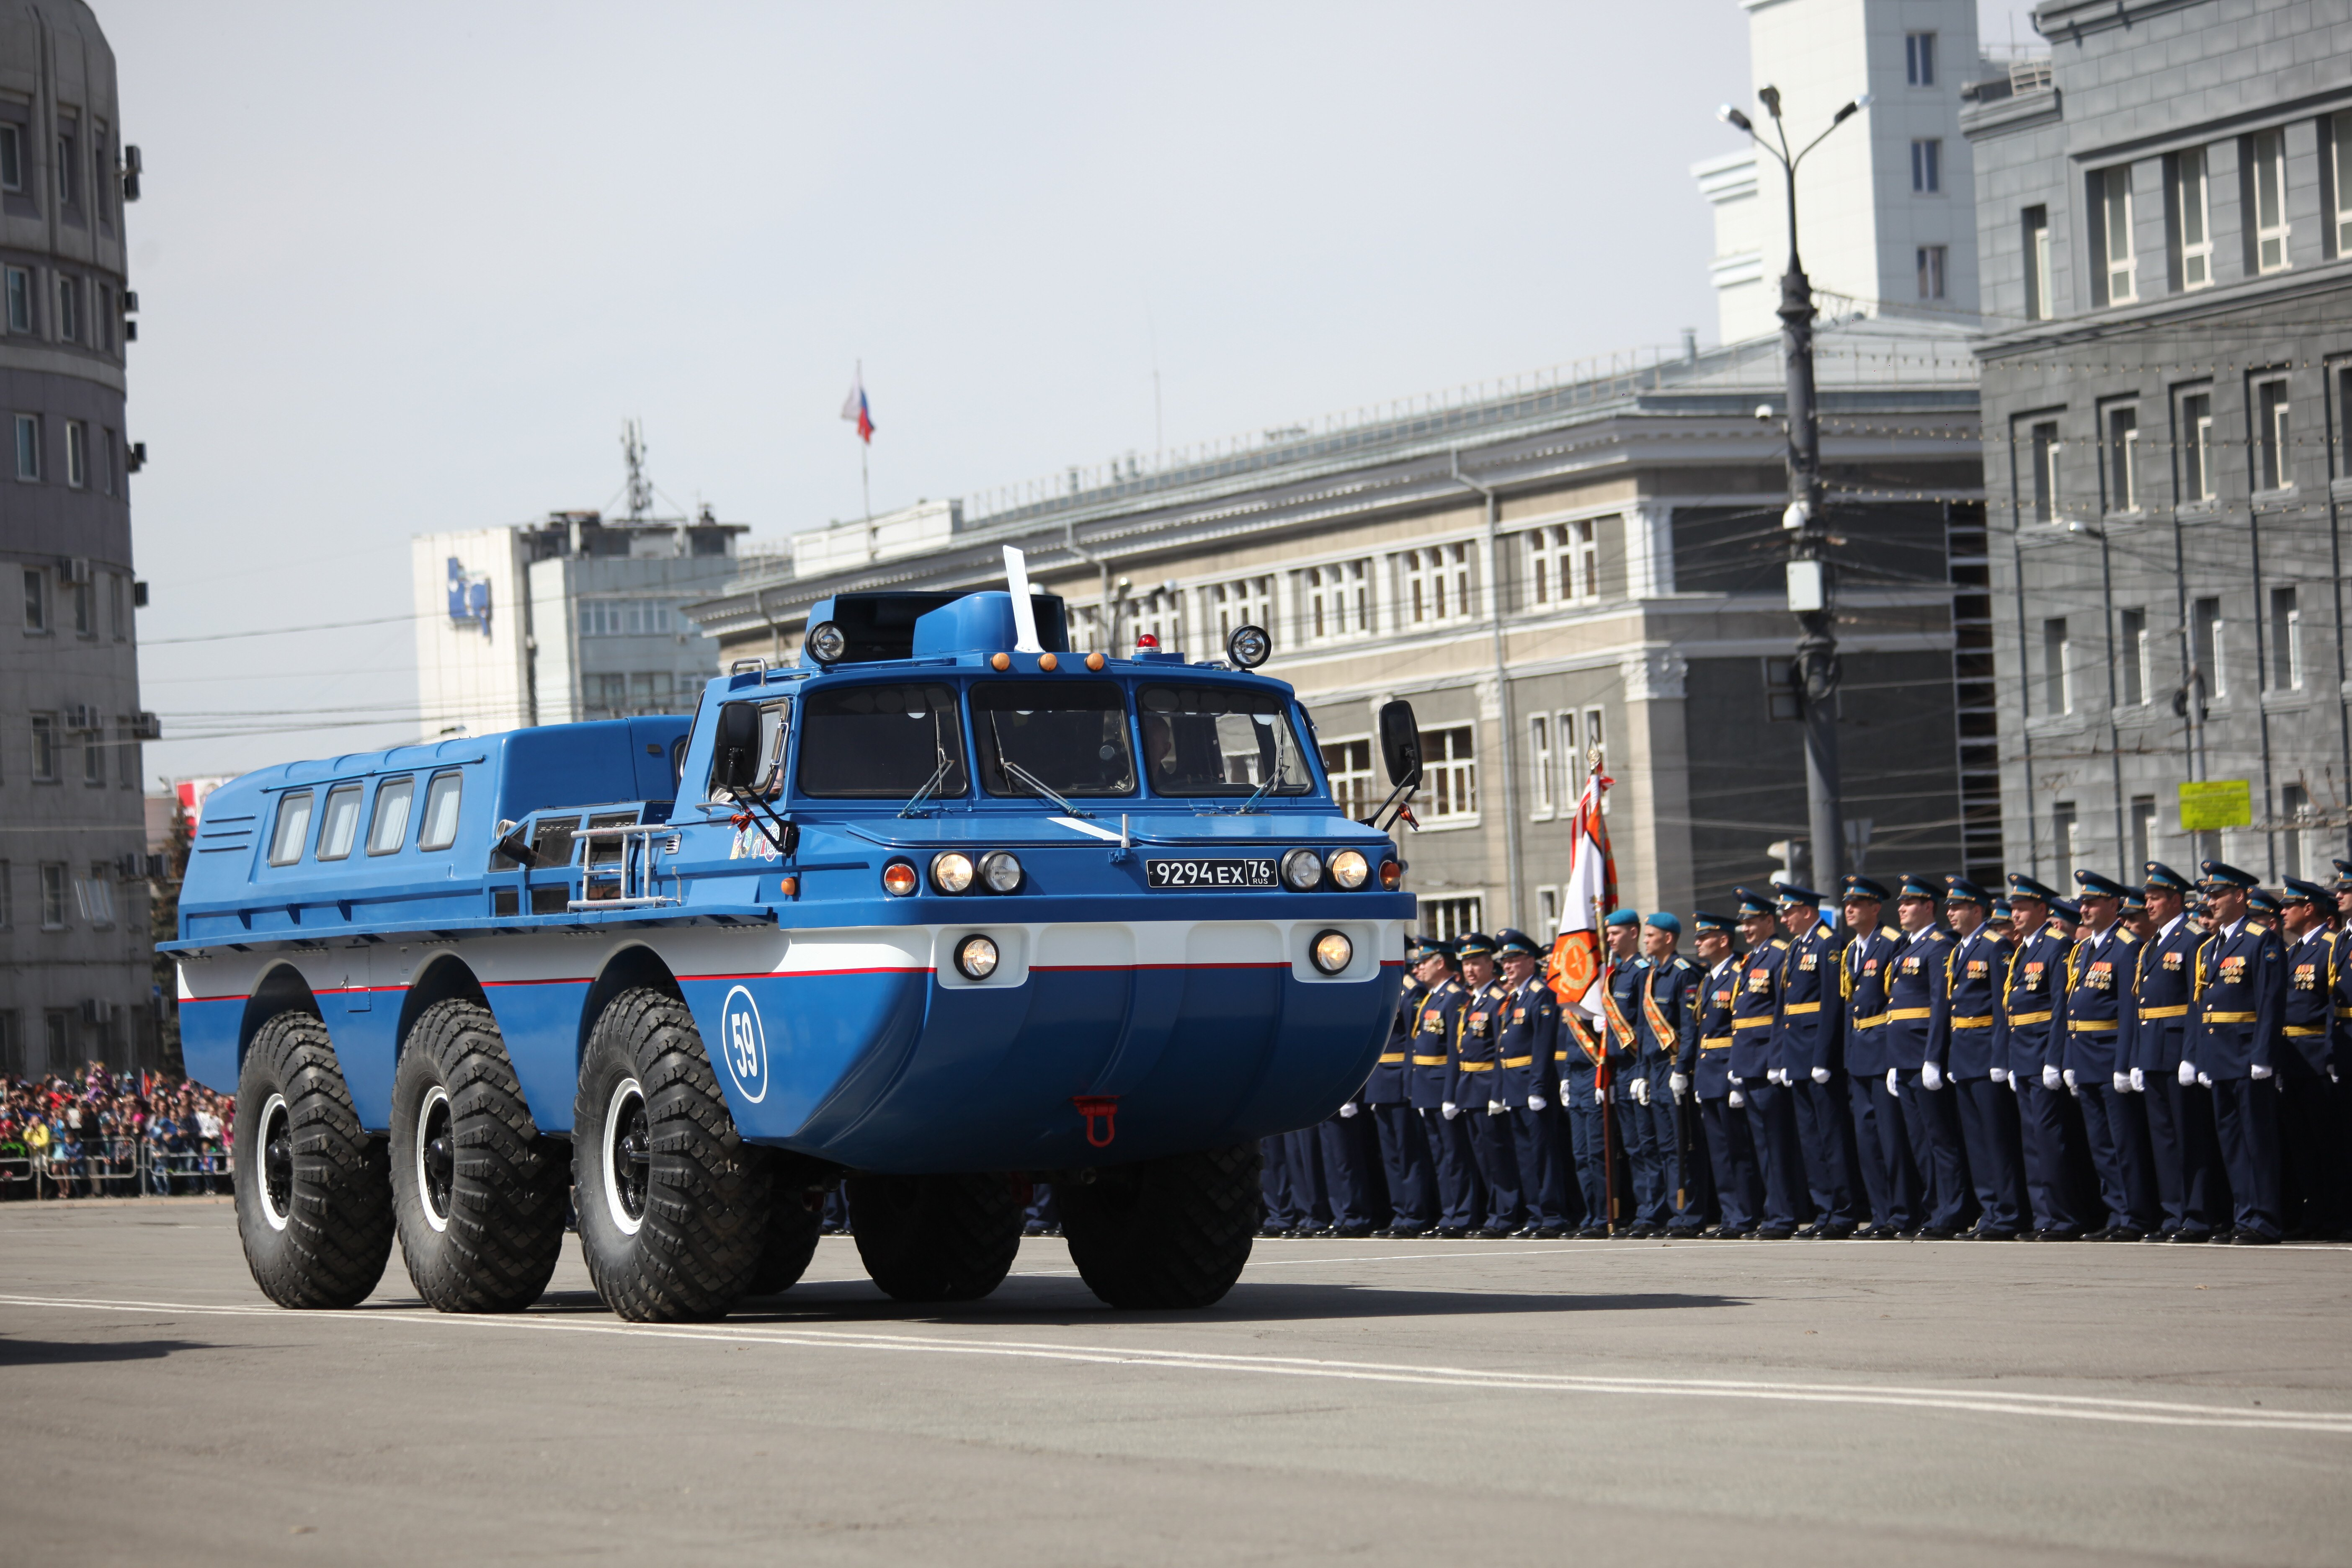 Бронетранспортер (10.05.2017) - Парад Победы вЧелябинске 2017